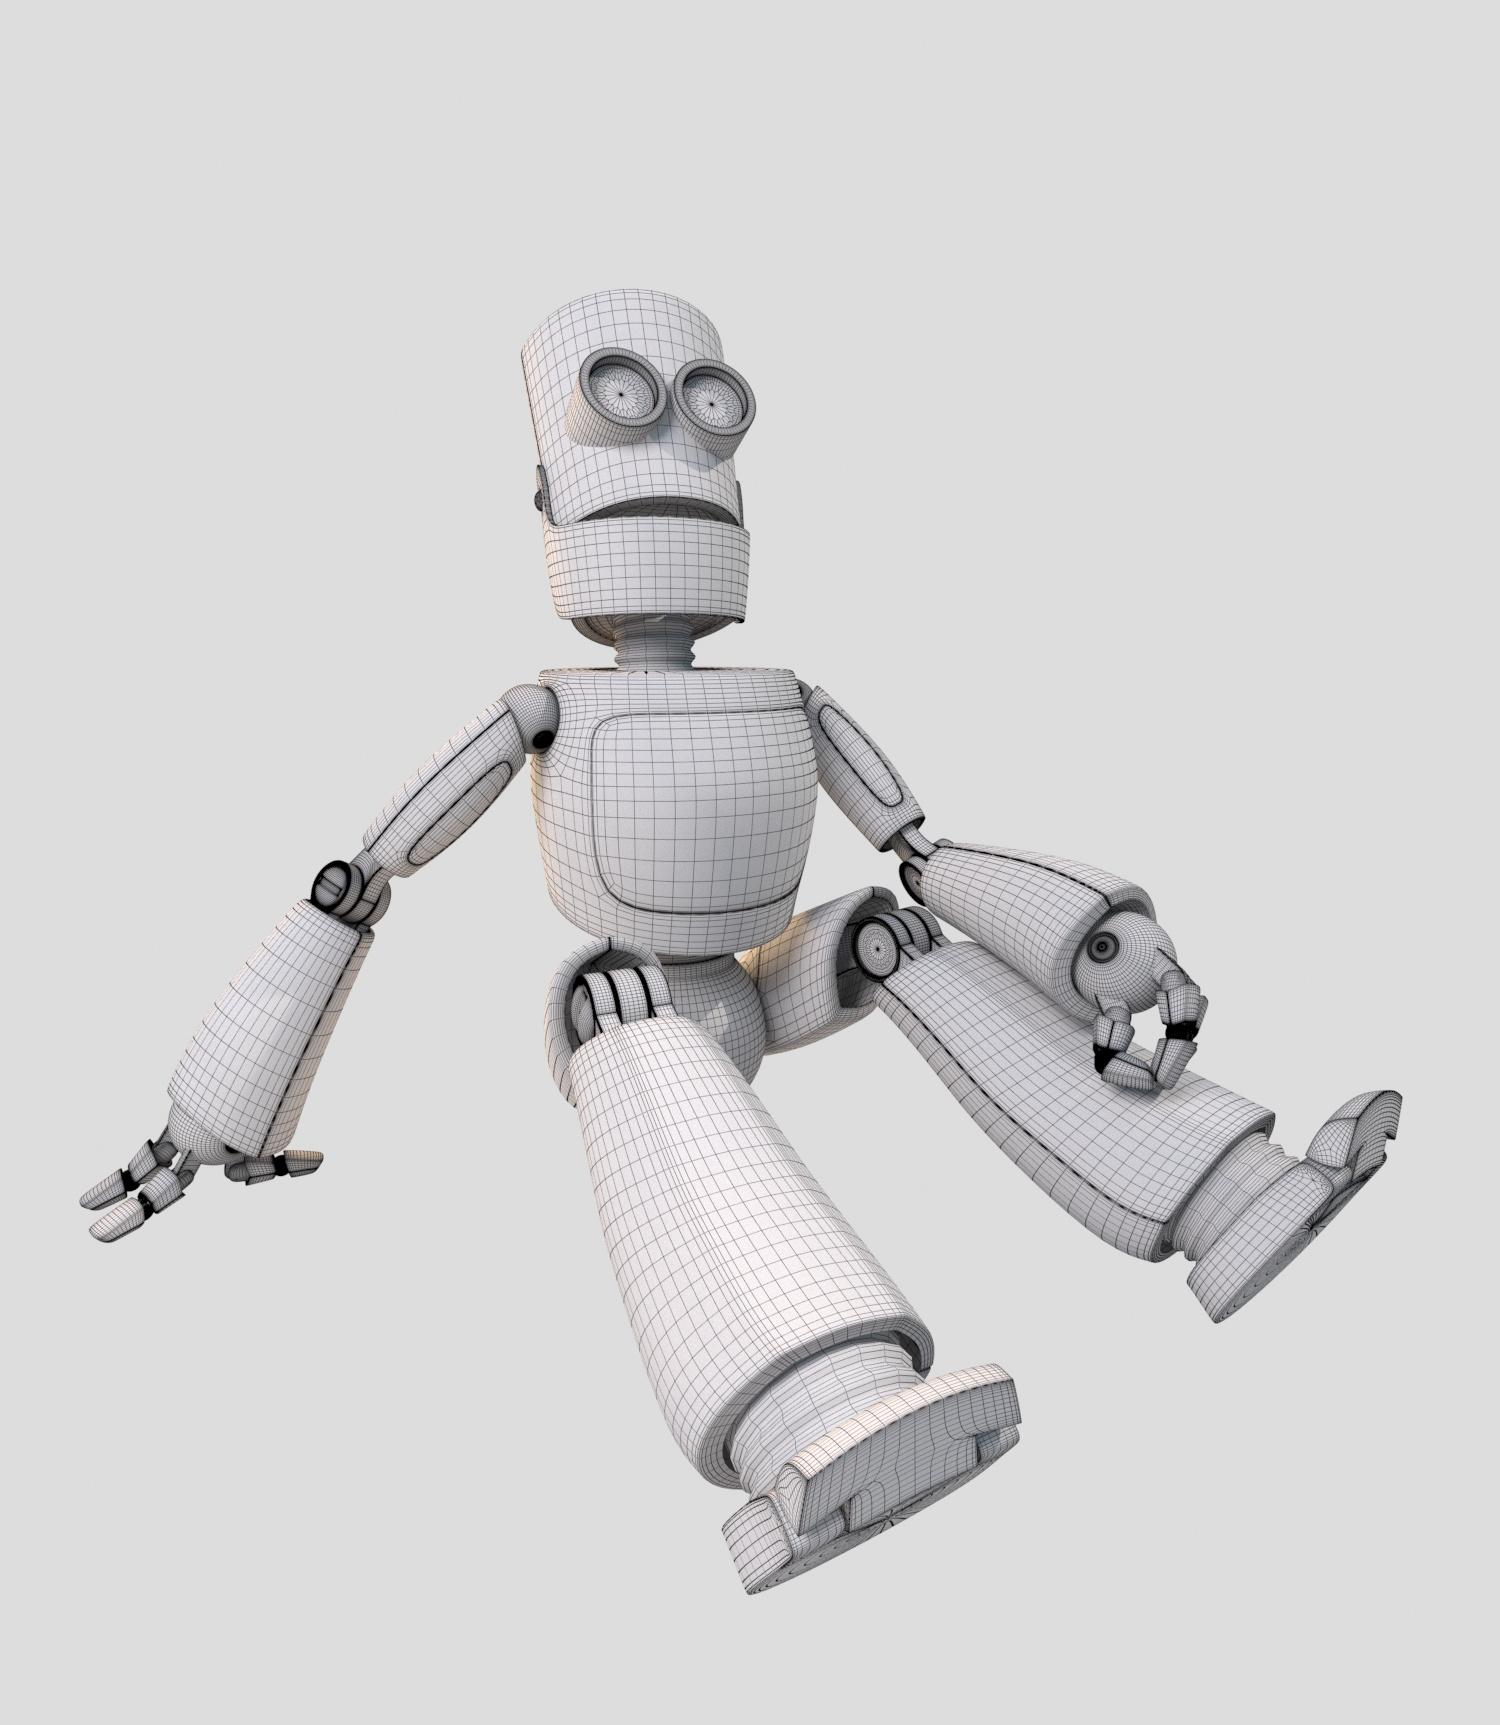 Robot. Orange robot by Gizart89   3DOcean